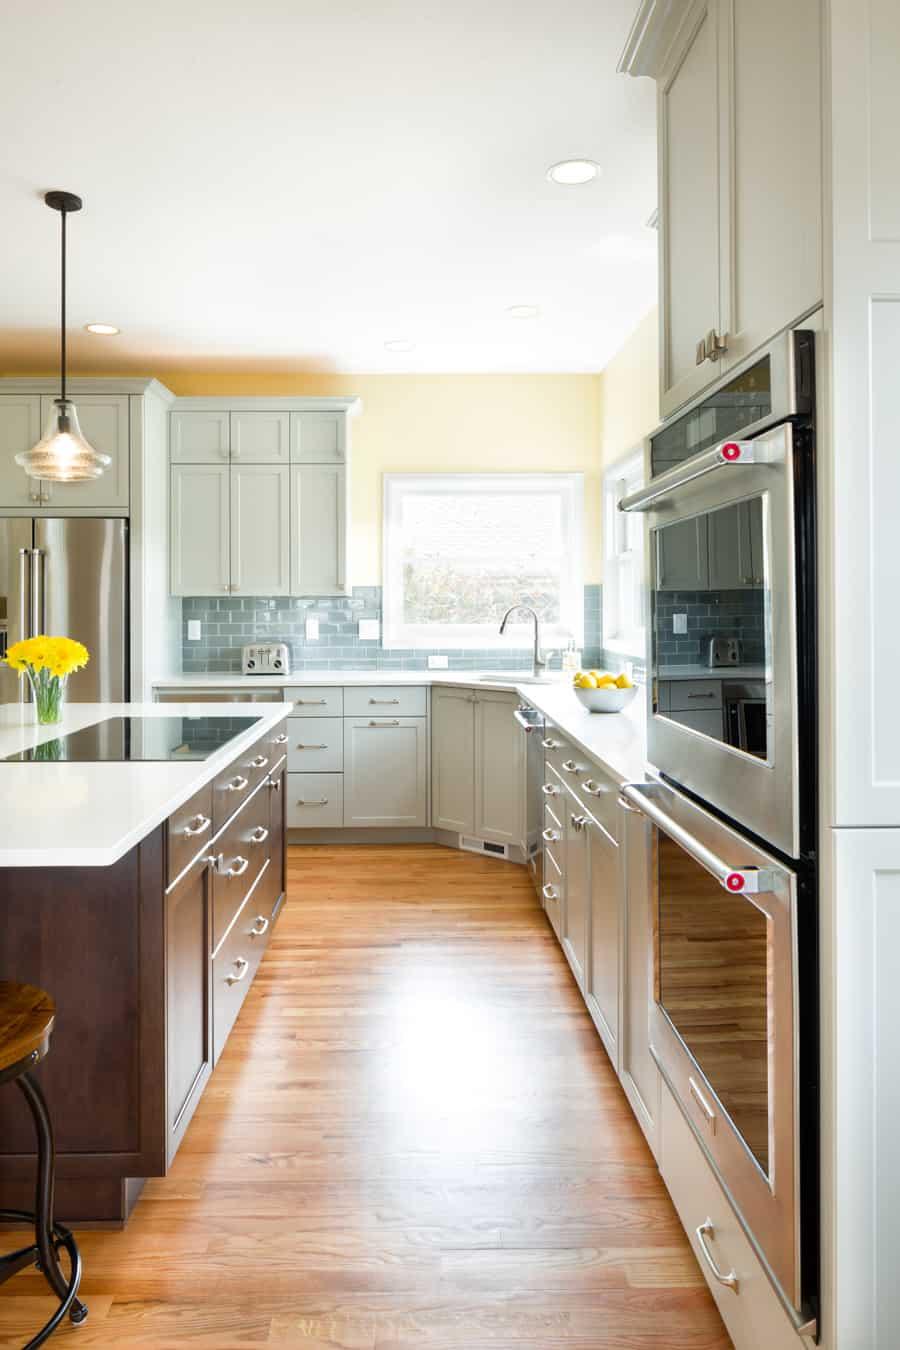 surprising bright sunny kitchen ideas | Sunny and Bright Kitchen - Melton Design Build